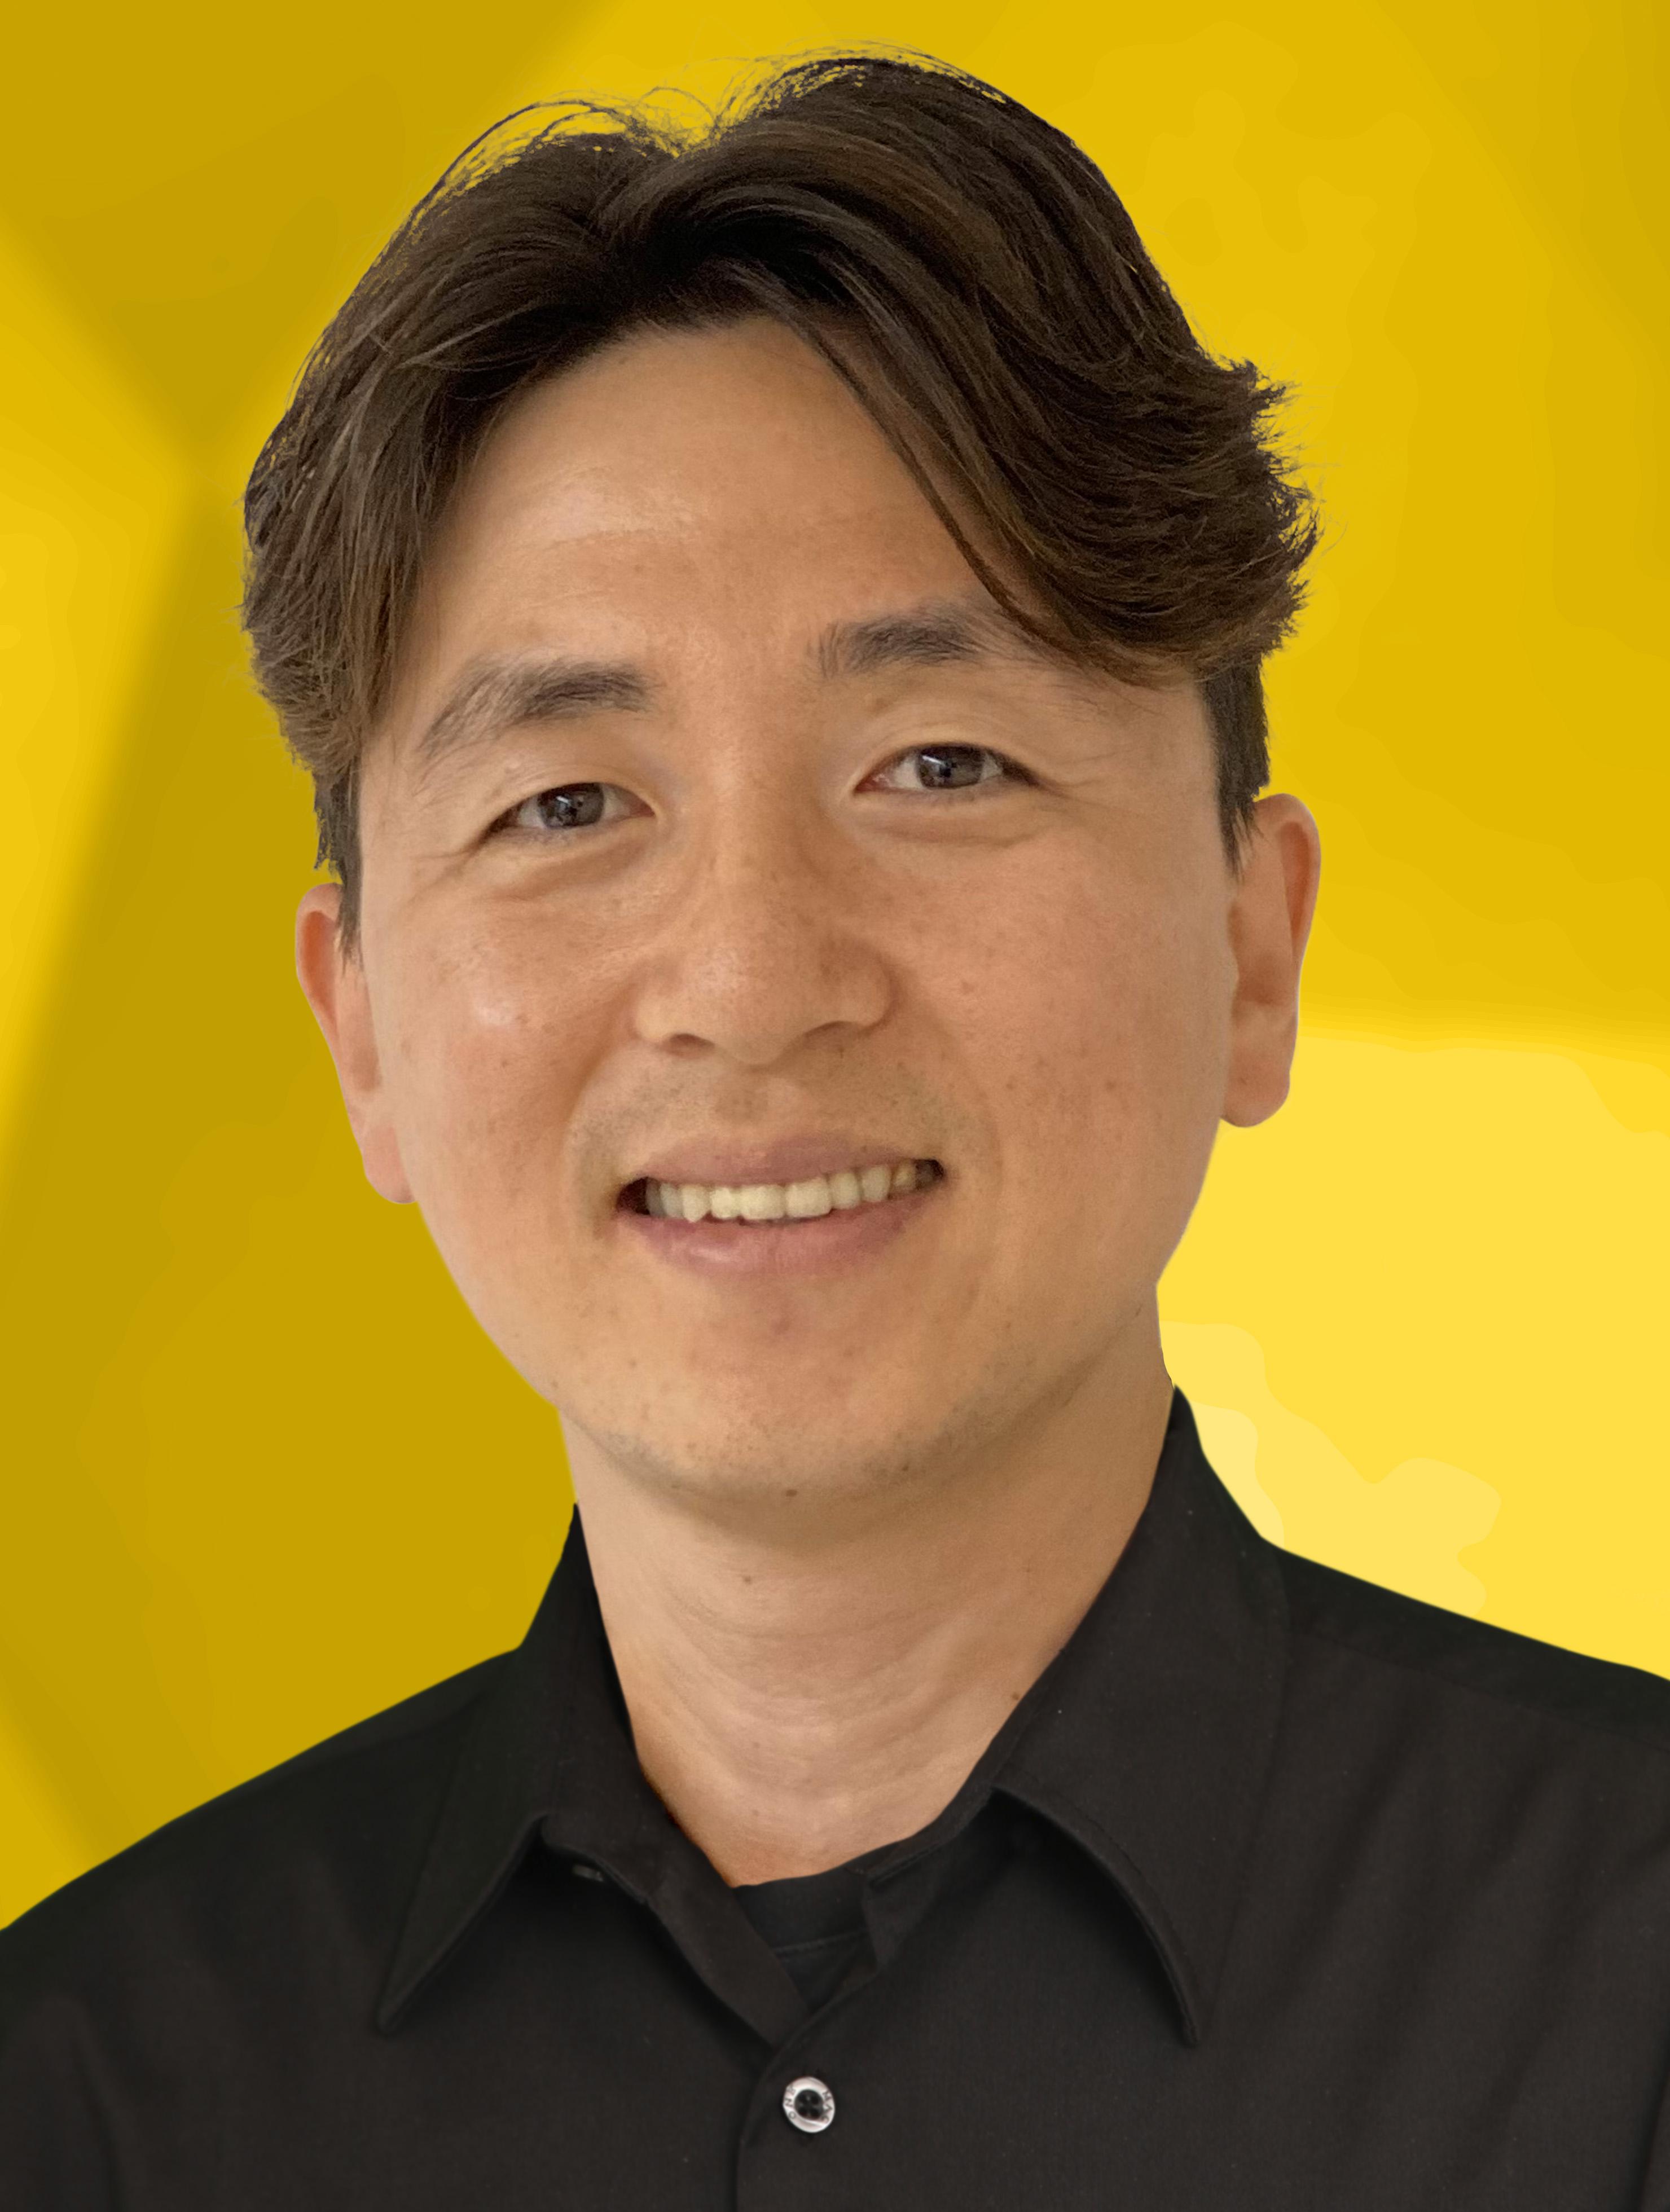 Profile picture of Henri Lee